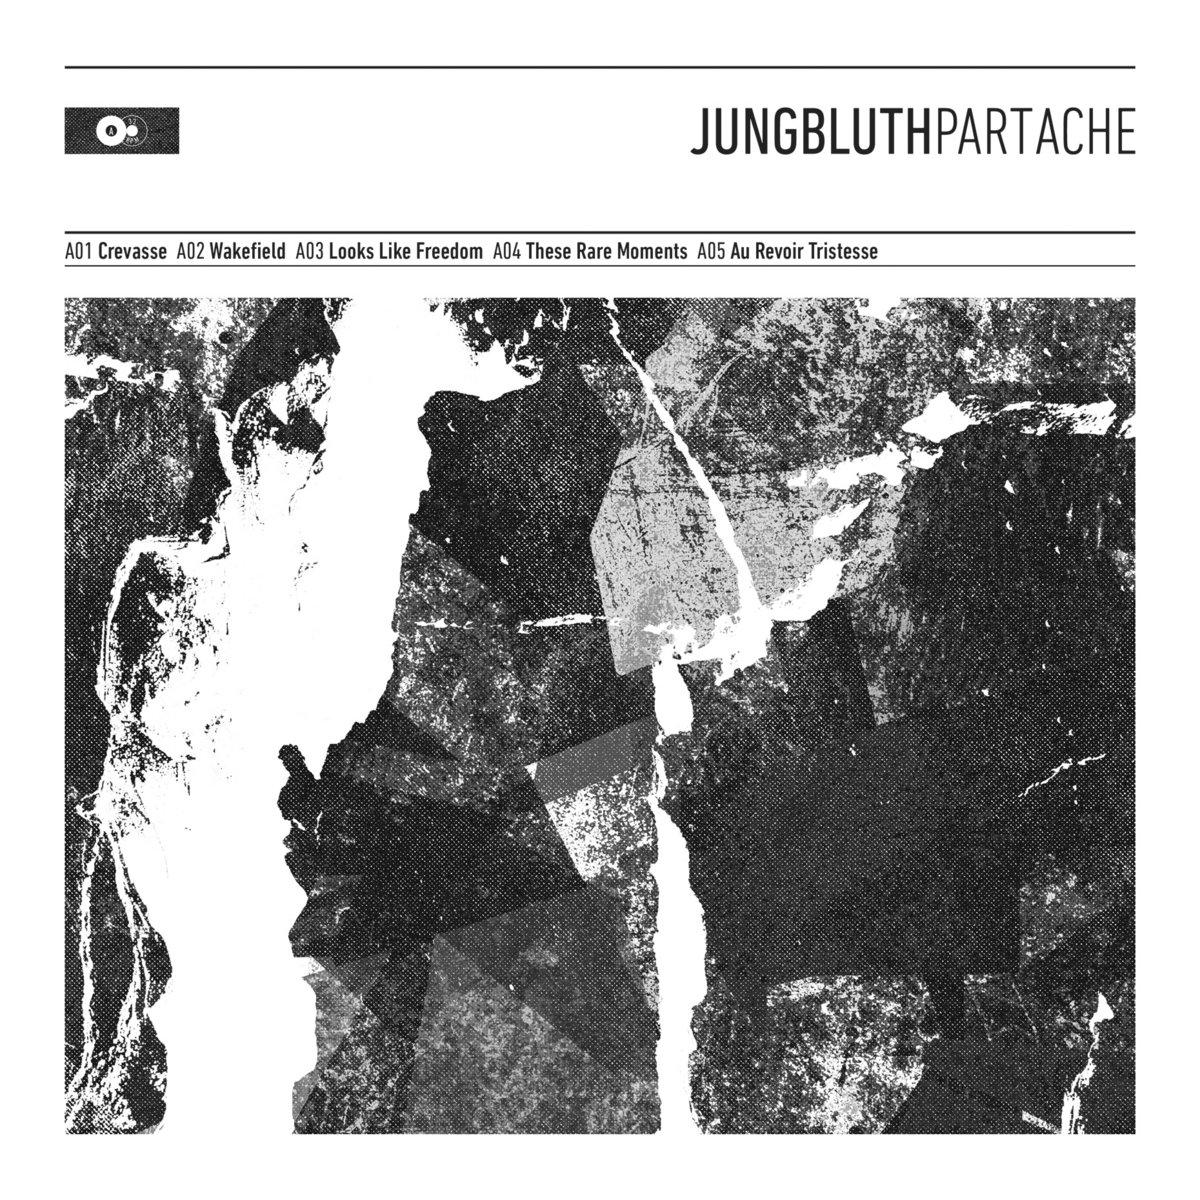 https://jungbluth.bandcamp.com/album/part-ache